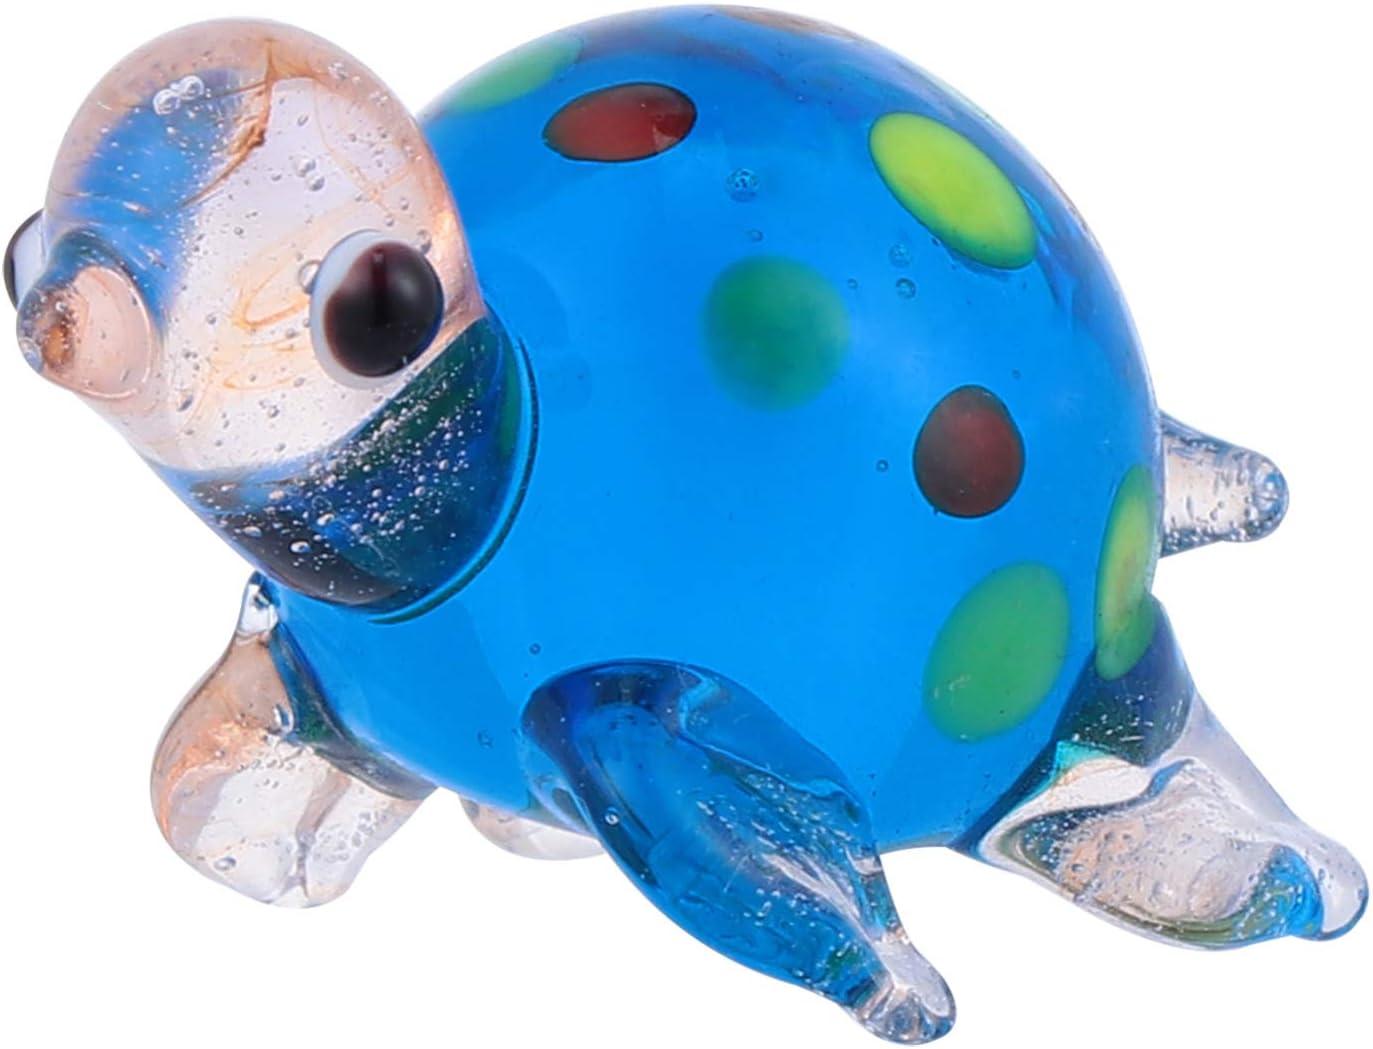 IMIKEYA Mini Glass Turtle Ornament Turtle Collectible Figurine Sea Animal Miniature Fairy Garden Bonsai Plant Pot Craft DIY Micro Landscape Dollhouse Supplies Party Favors Gifts Style 1